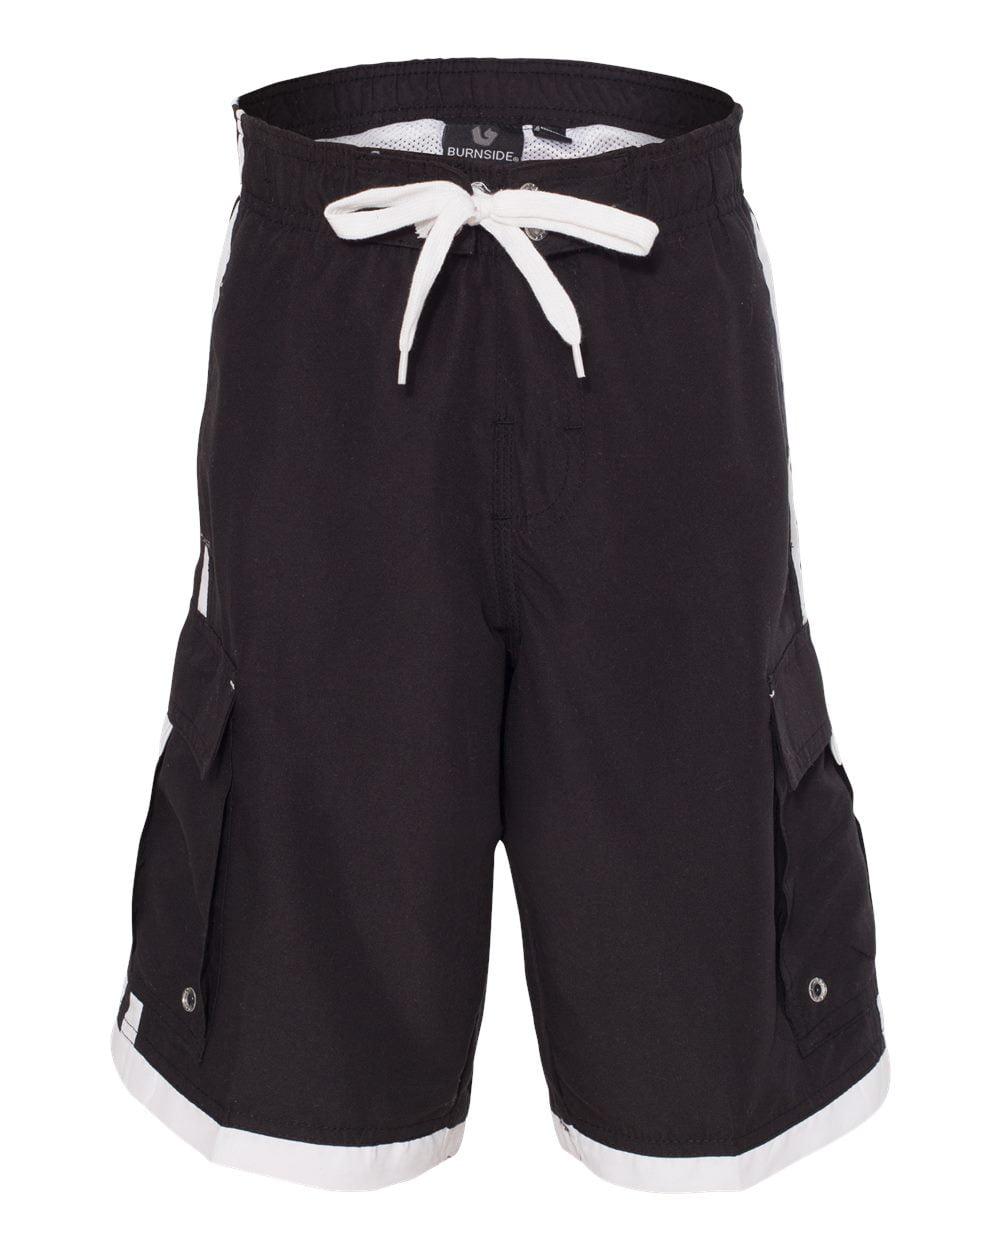 Burnside 4401 Boy's Striped Swim Trunks - Black/ White - X-Large